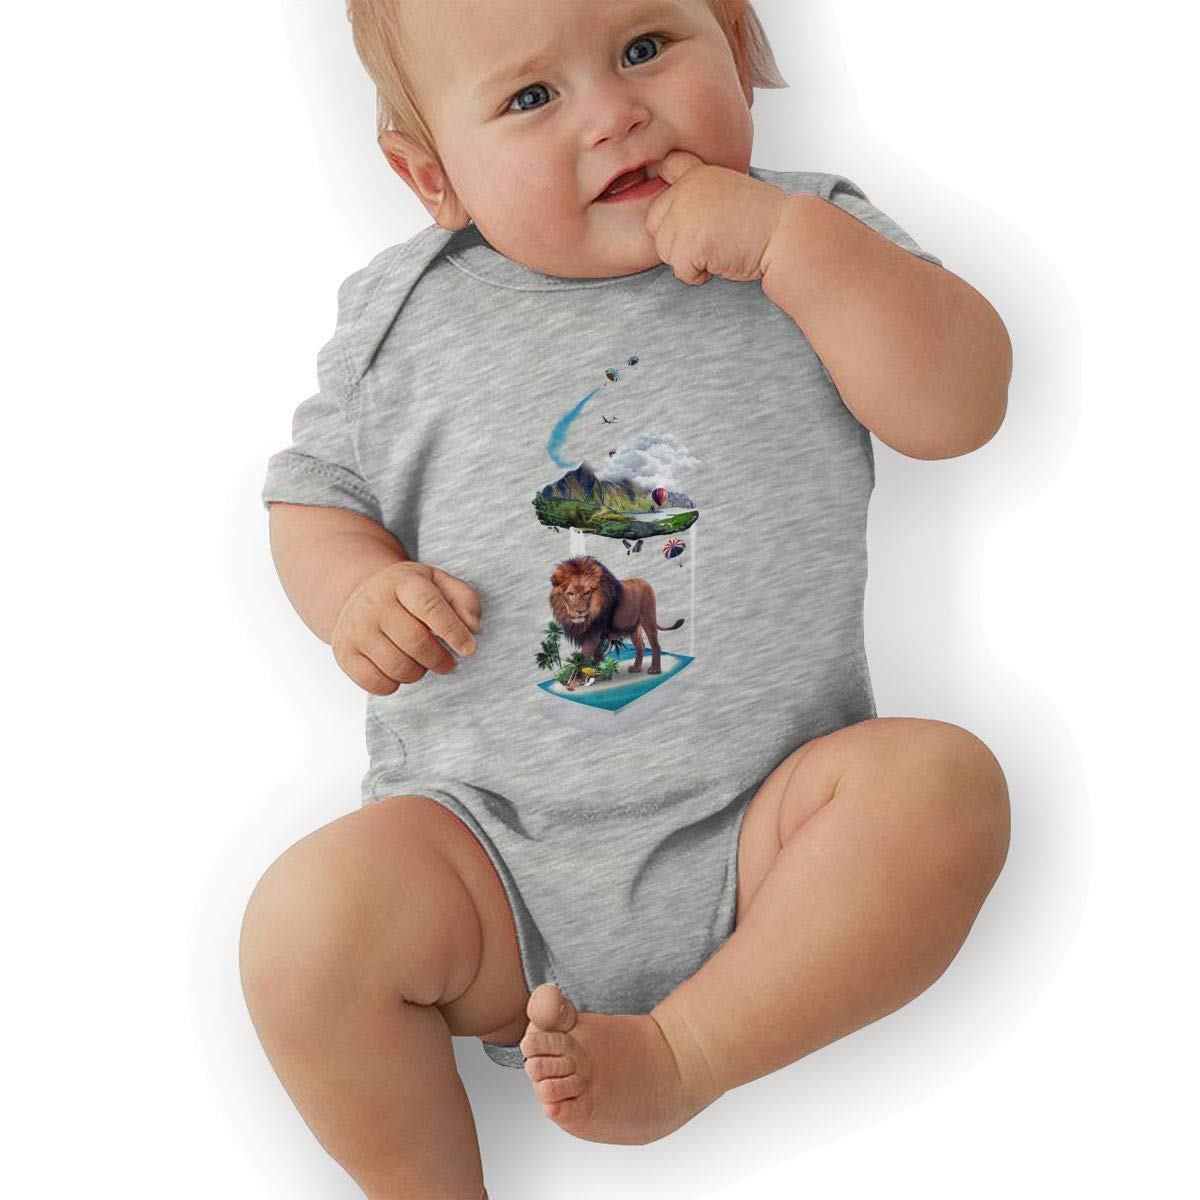 Newborn Baby Boys Bodysuit Short-Sleeve Onesie Creative Suspension Print Outfit Spring Pajamas